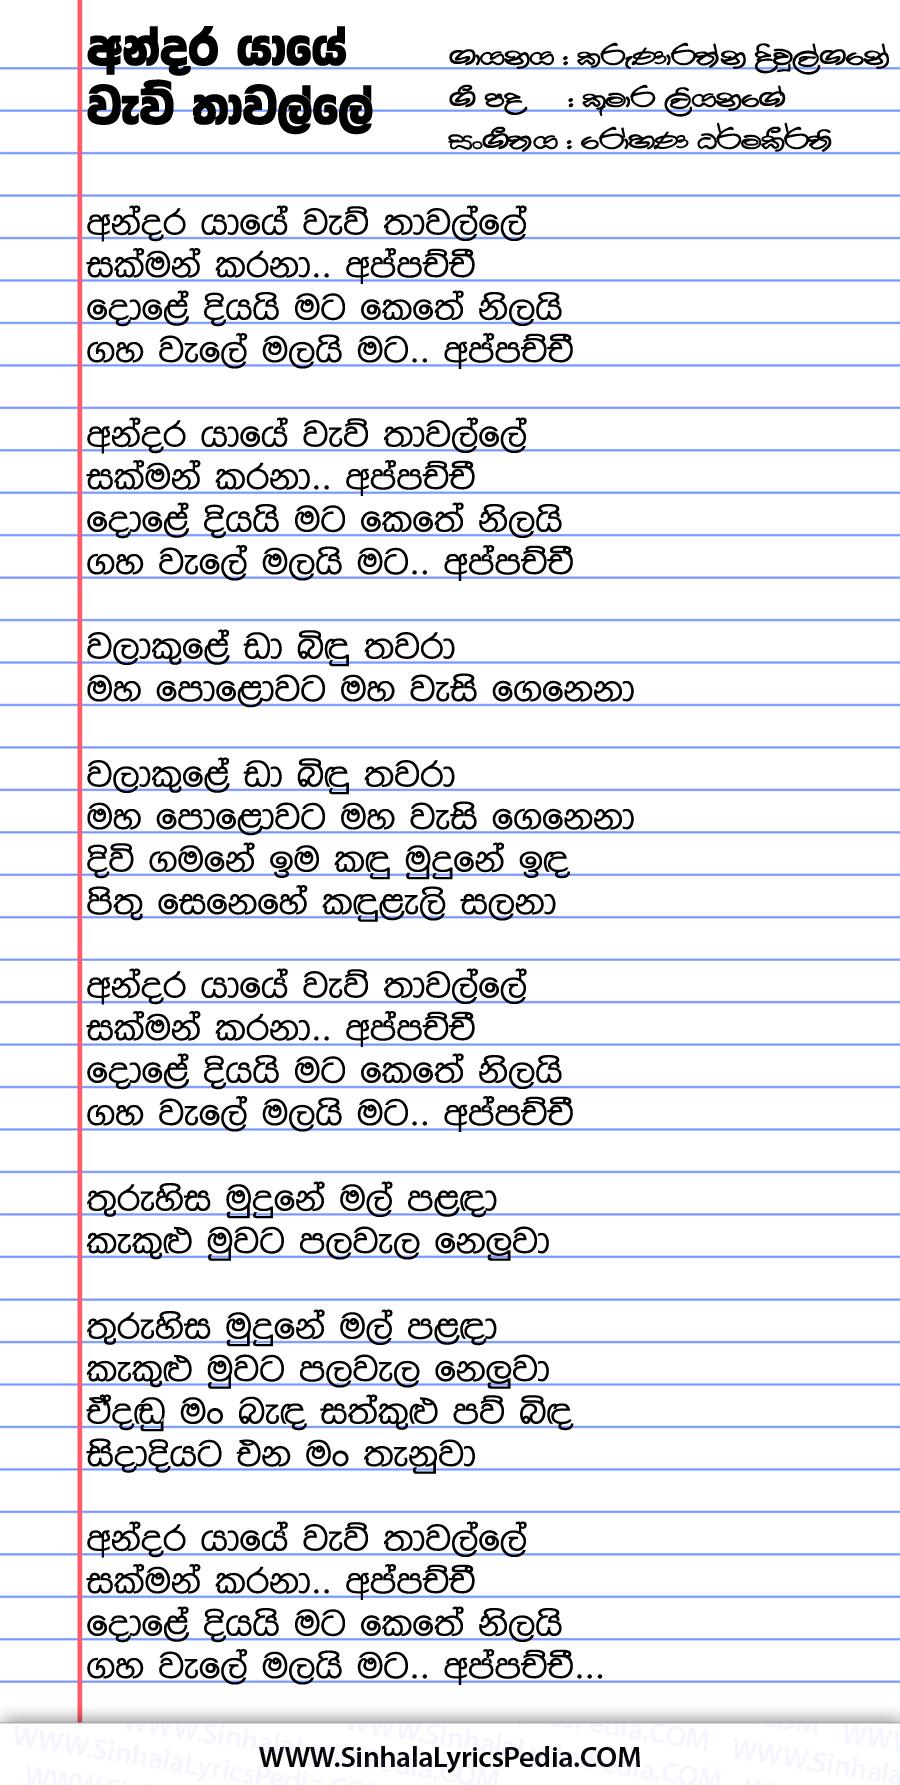 Andara Yaye Waw Thawalle Song Lyrics